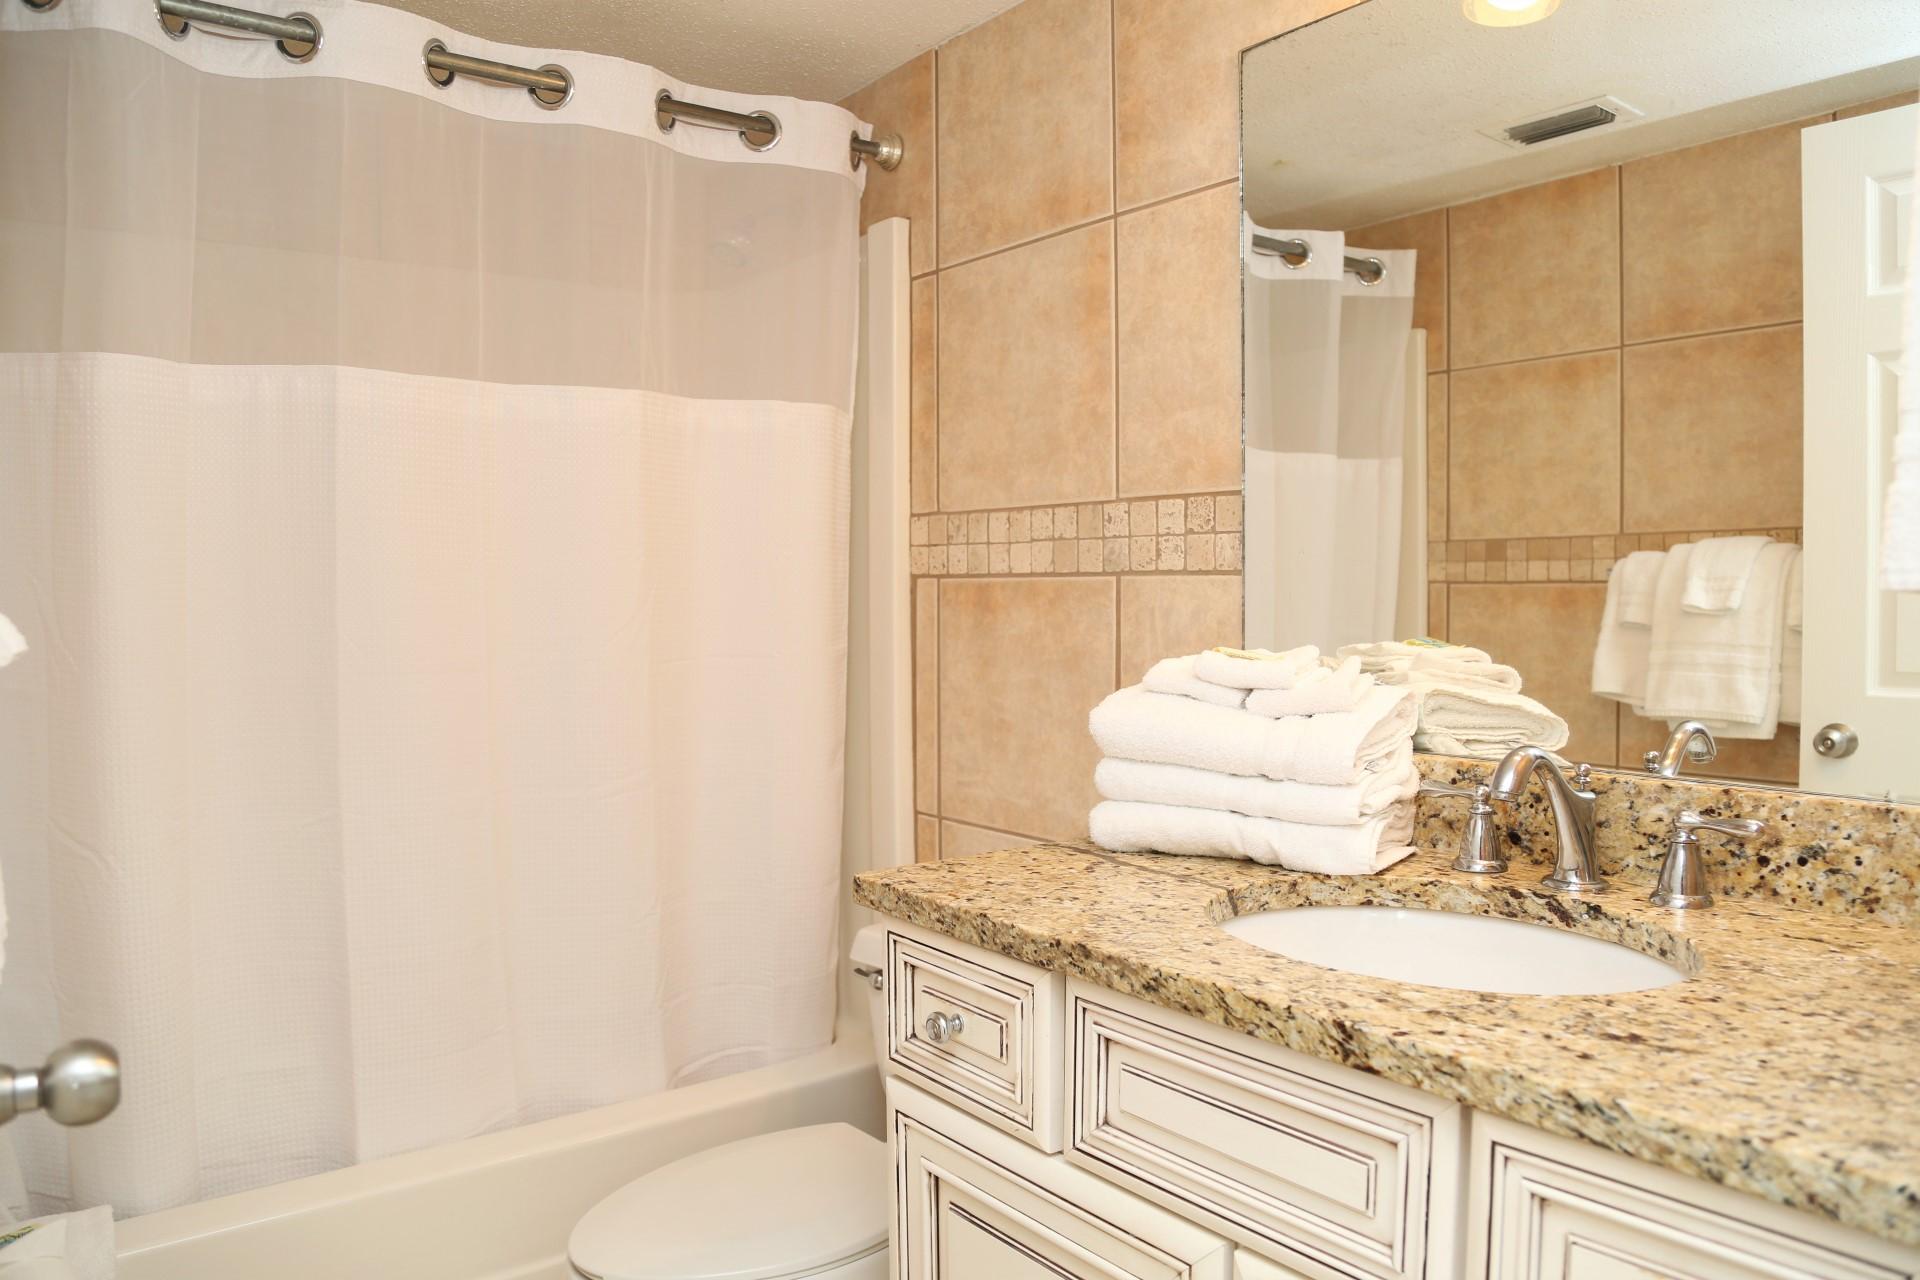 Hallway bathroom - shower/tub combo with granite countertop